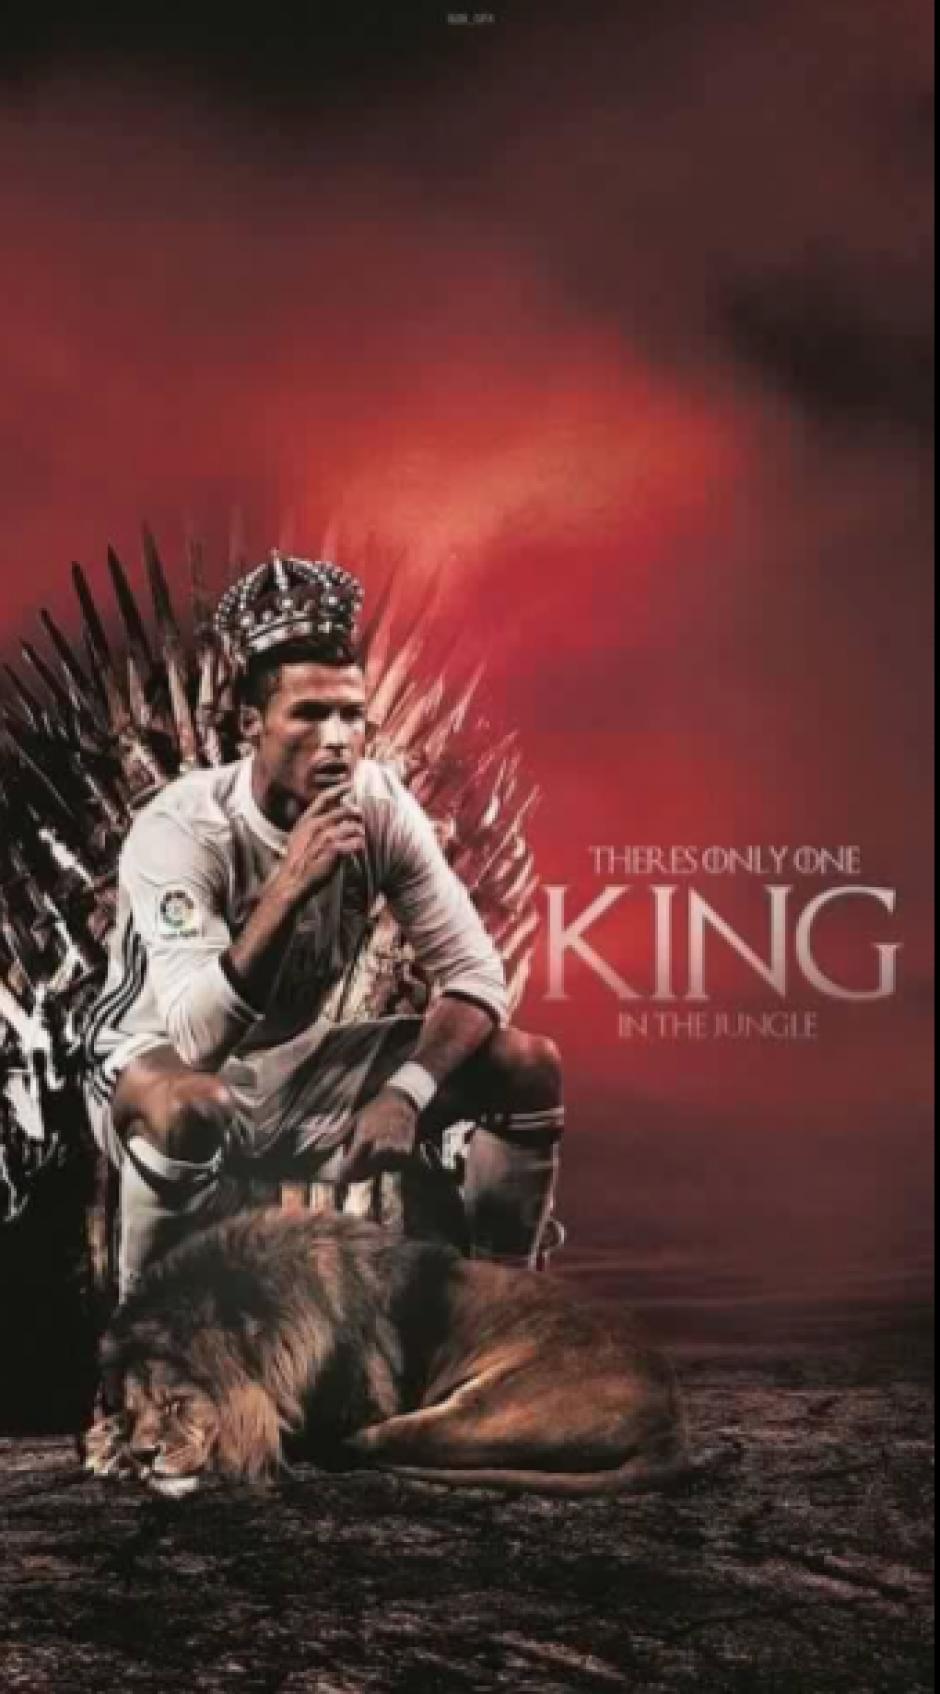 El rey Cristiano Ronaldo. (Foto: Twitter)